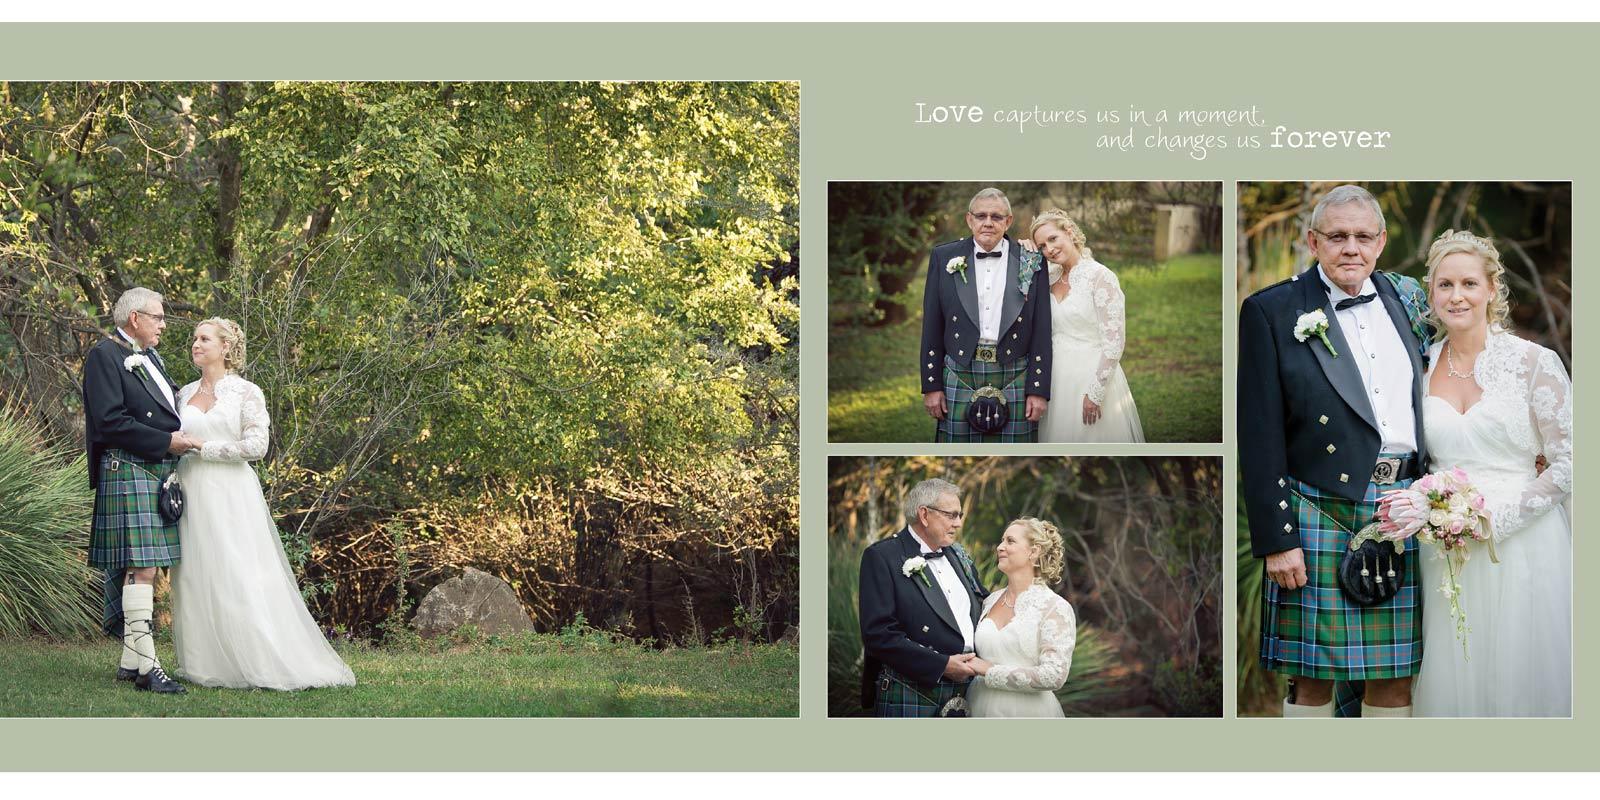 Nathalie Boucry Photography | Deidre and Lister Wedding Album 017